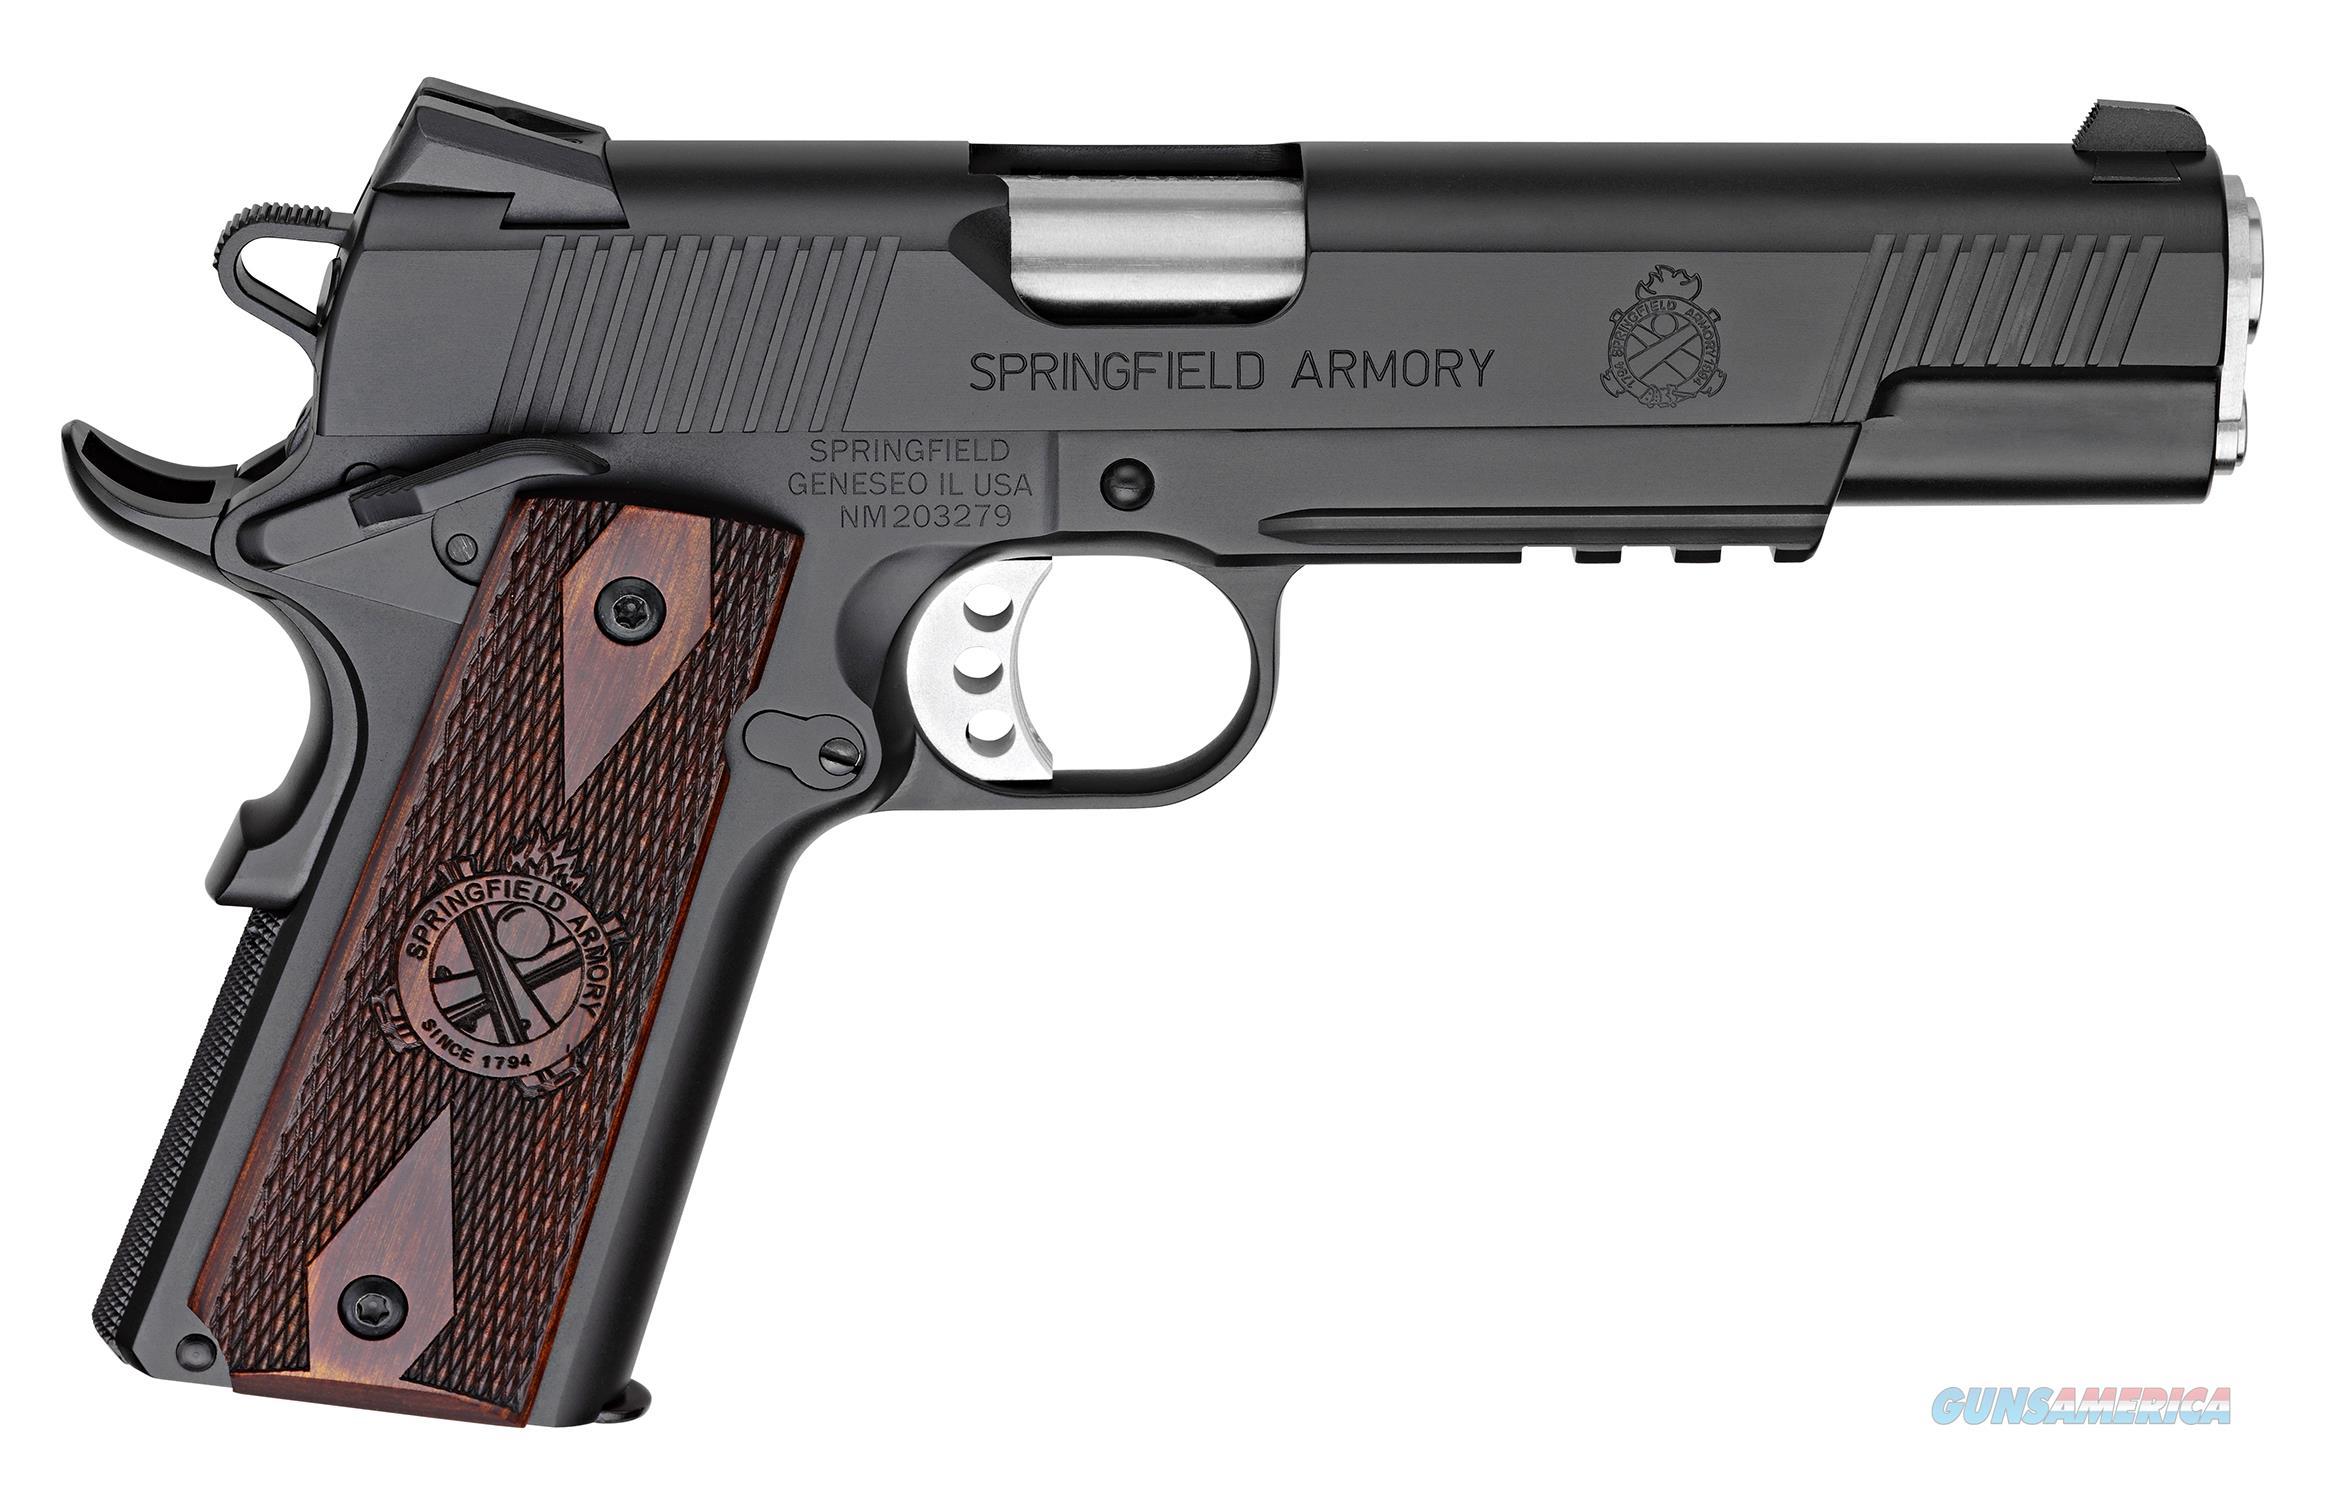 "Springfield 1911 Loaded .45 ACP Black 5"" w/Range Bag PX9116L18  Guns > Pistols > Springfield Armory Pistols > 1911 Type"